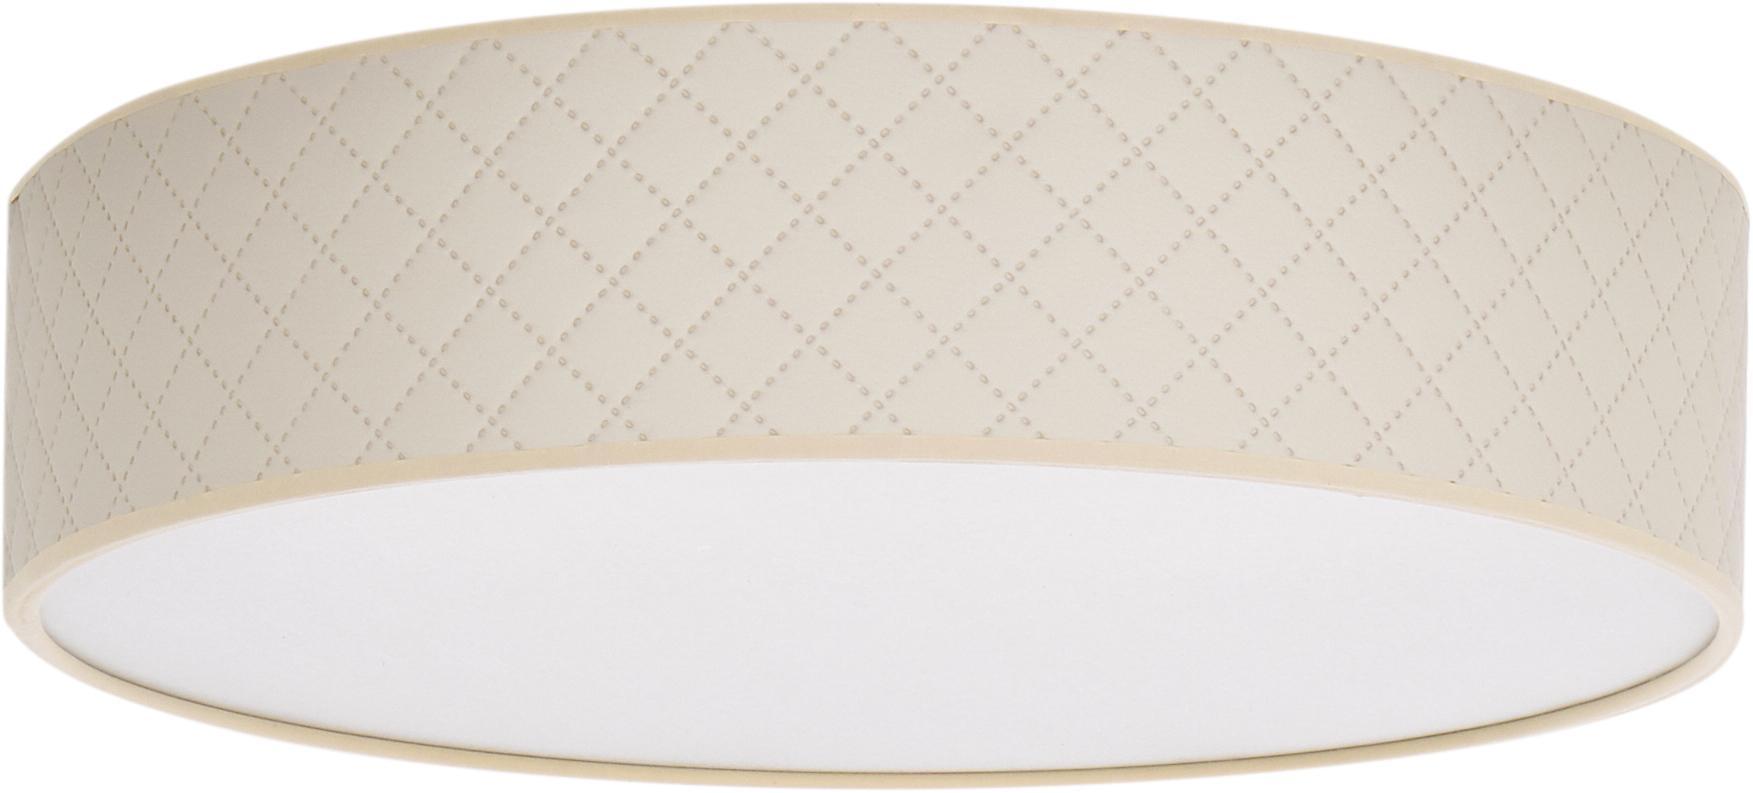 Plafoniera in pelle Trece, Paralume: pelle, Crema, Ø 40 x Alt. 11 cm